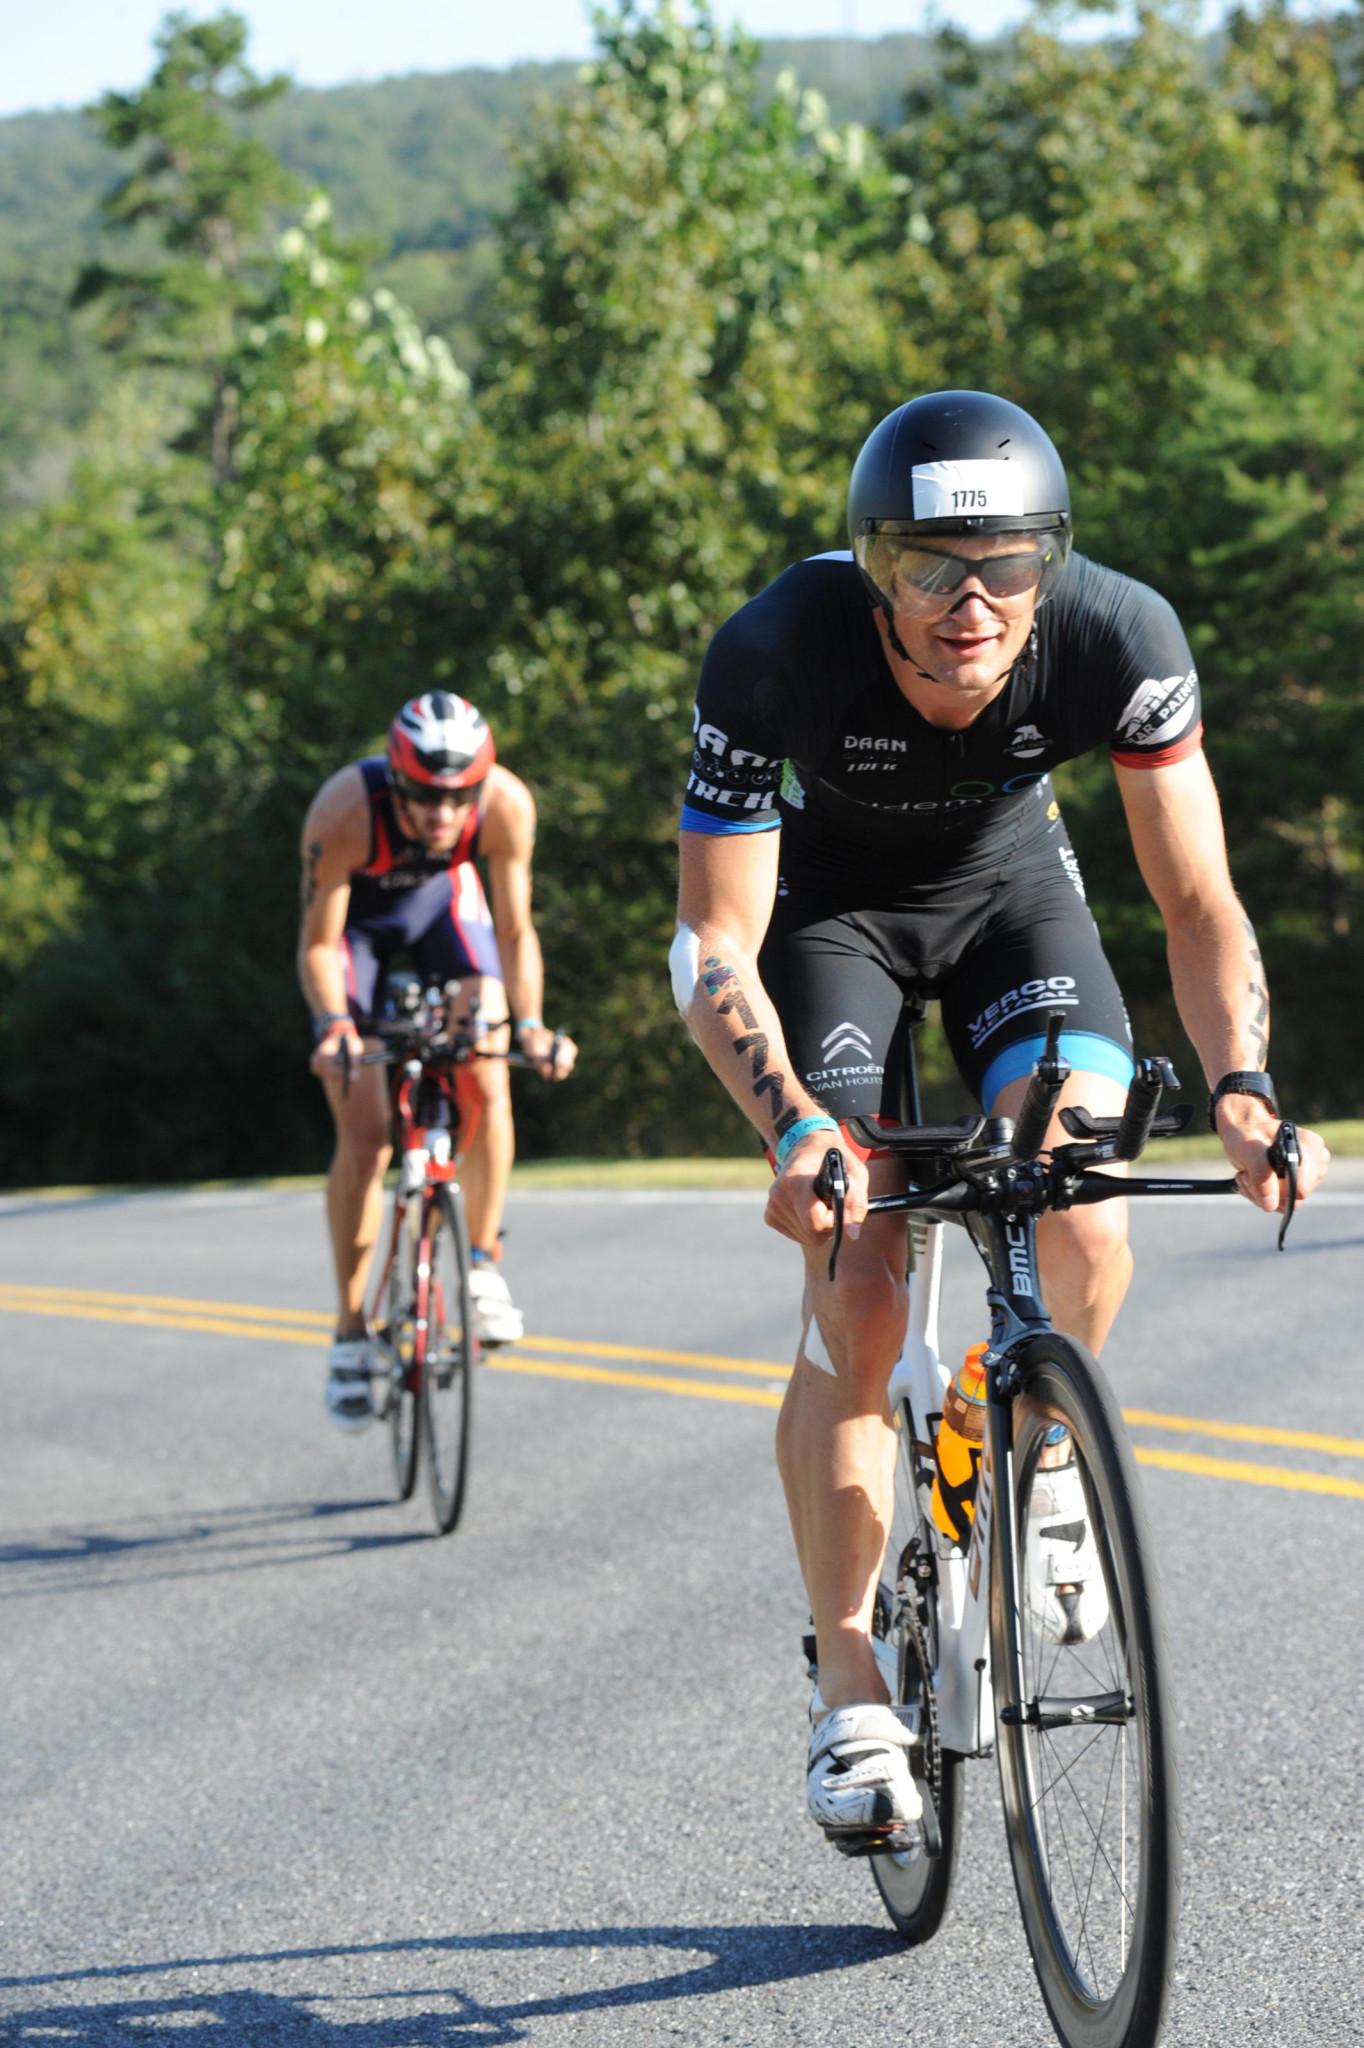 Delbeke Chattanooga Bike 2